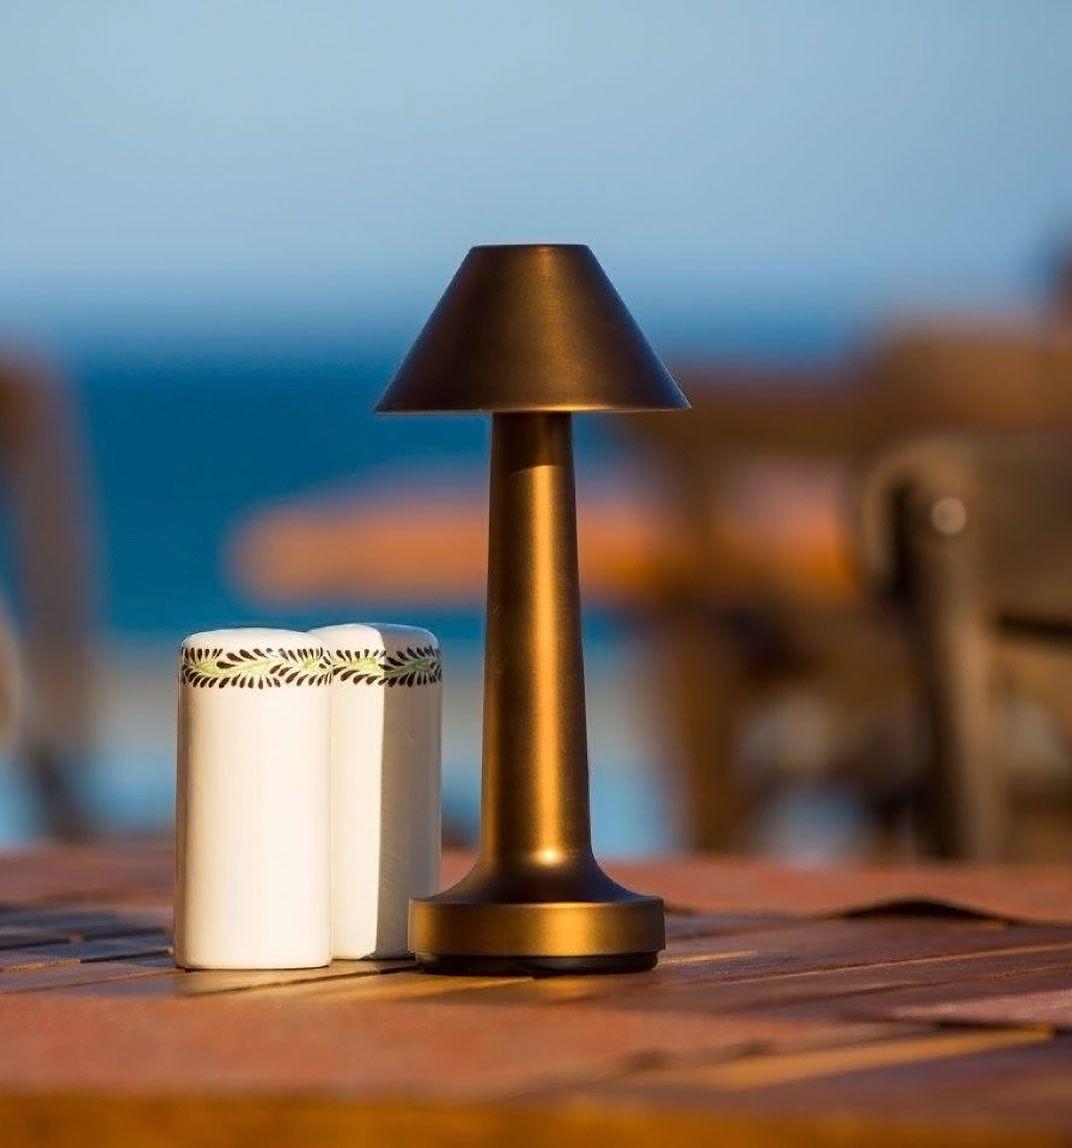 Www Neoz Com Neoz Cordless Lamp cooee 3   cordless lamp   neoz lighting   cordless lamps